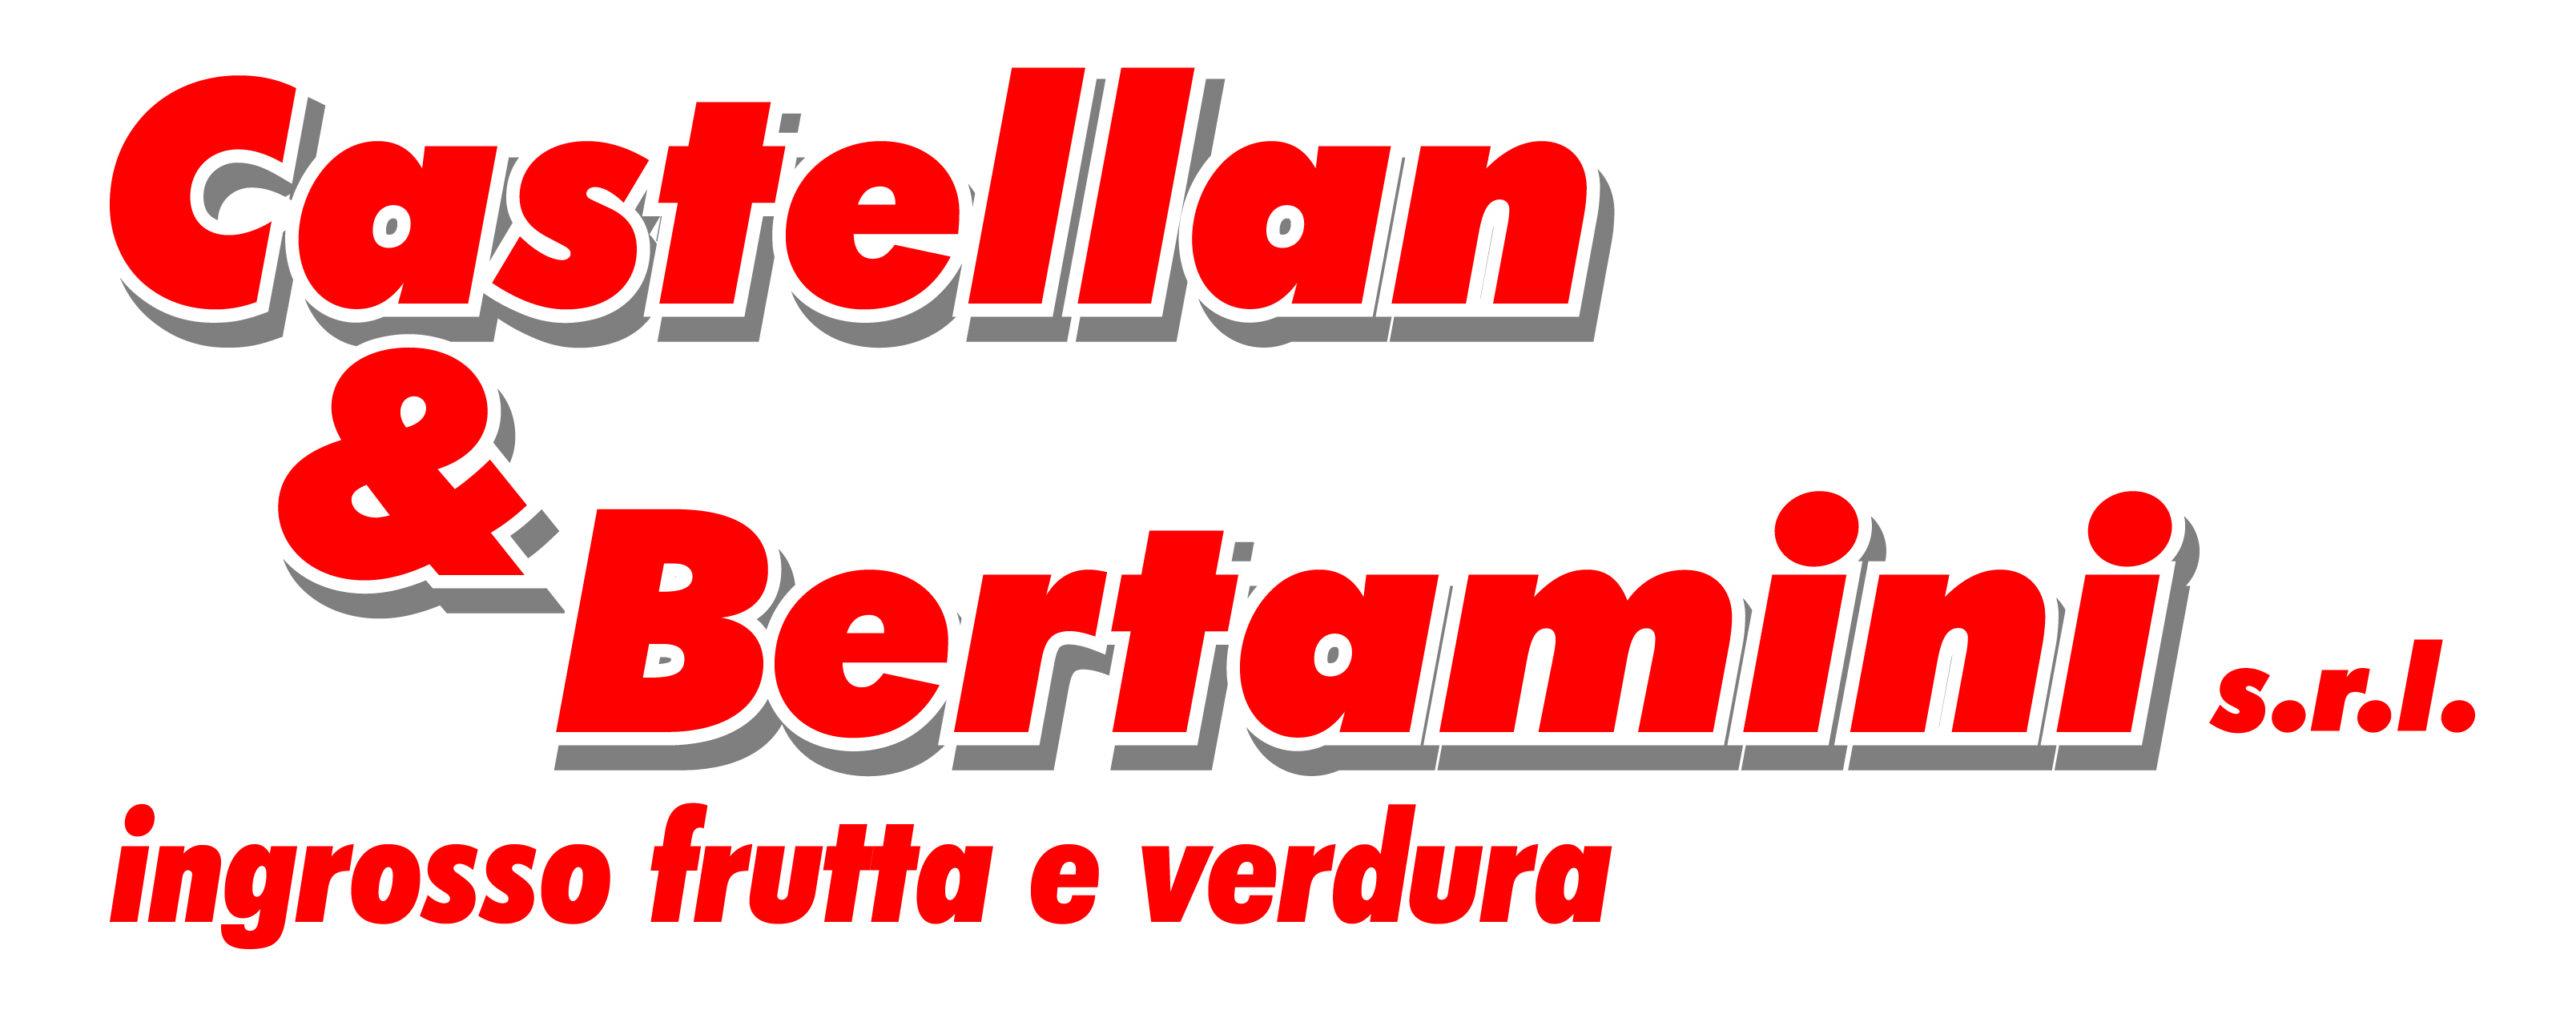 CASTELLAN & BERTAMINI SRL